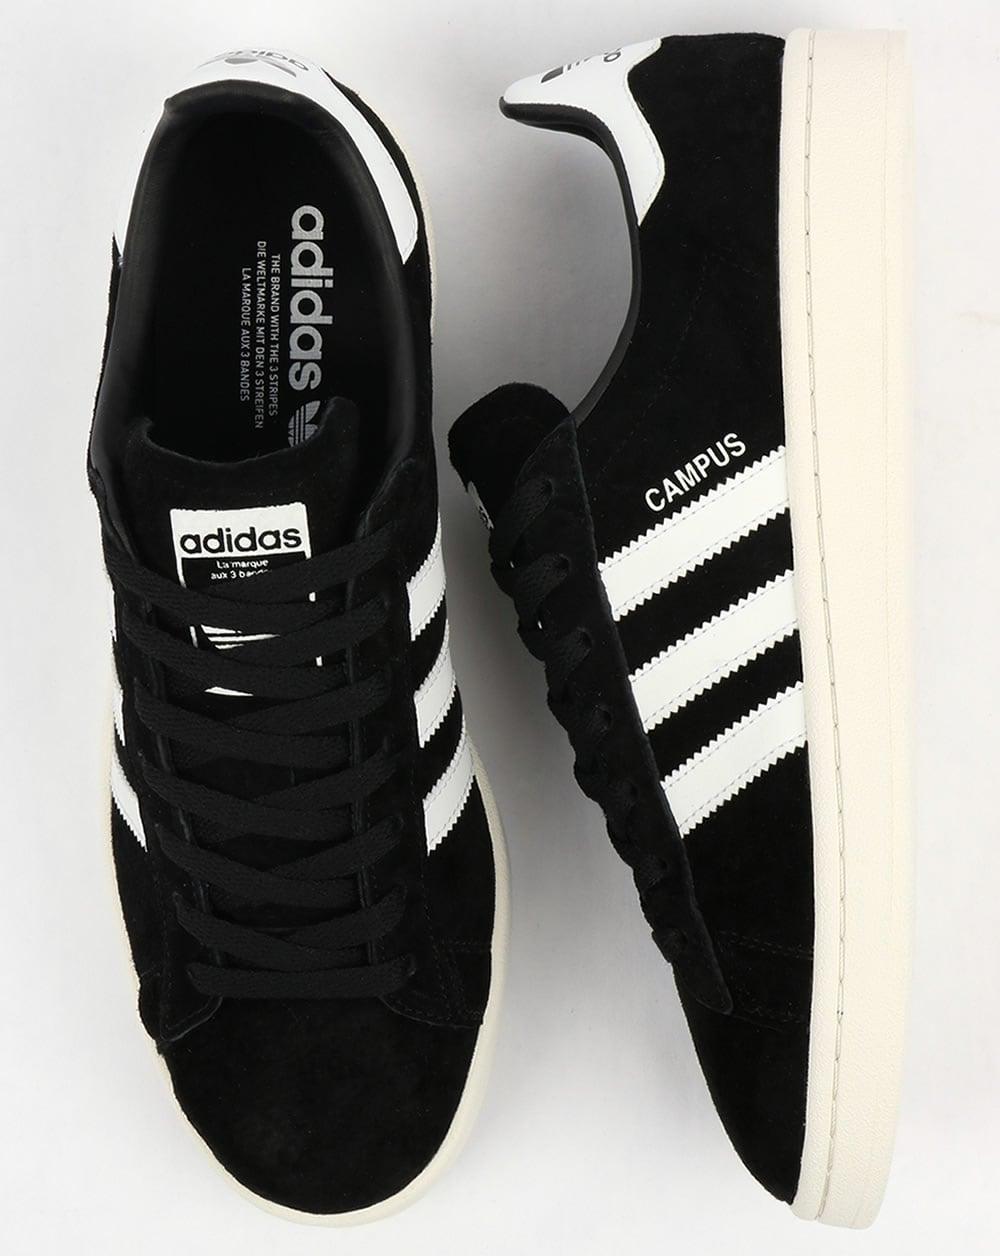 pecador abajo Sofisticado  Adidas Campus Trainers Black/White,originals,suede,shoes,mens